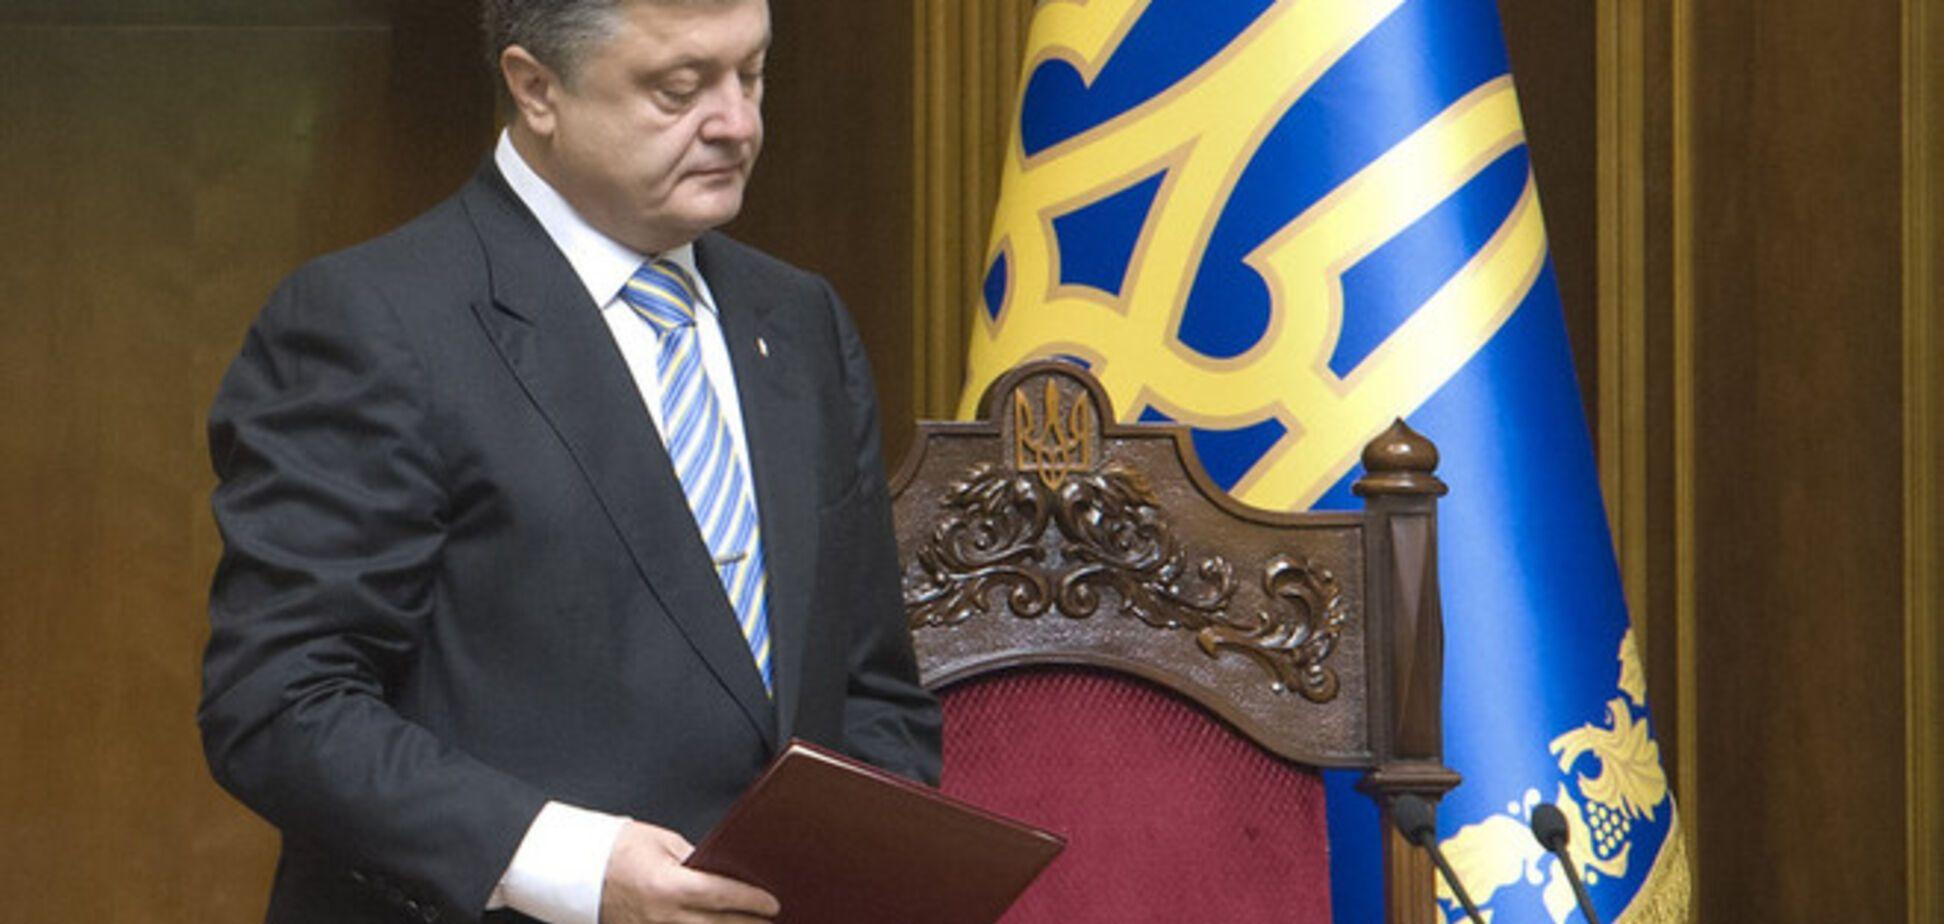 Порошенко приступил к работе на посту Президента